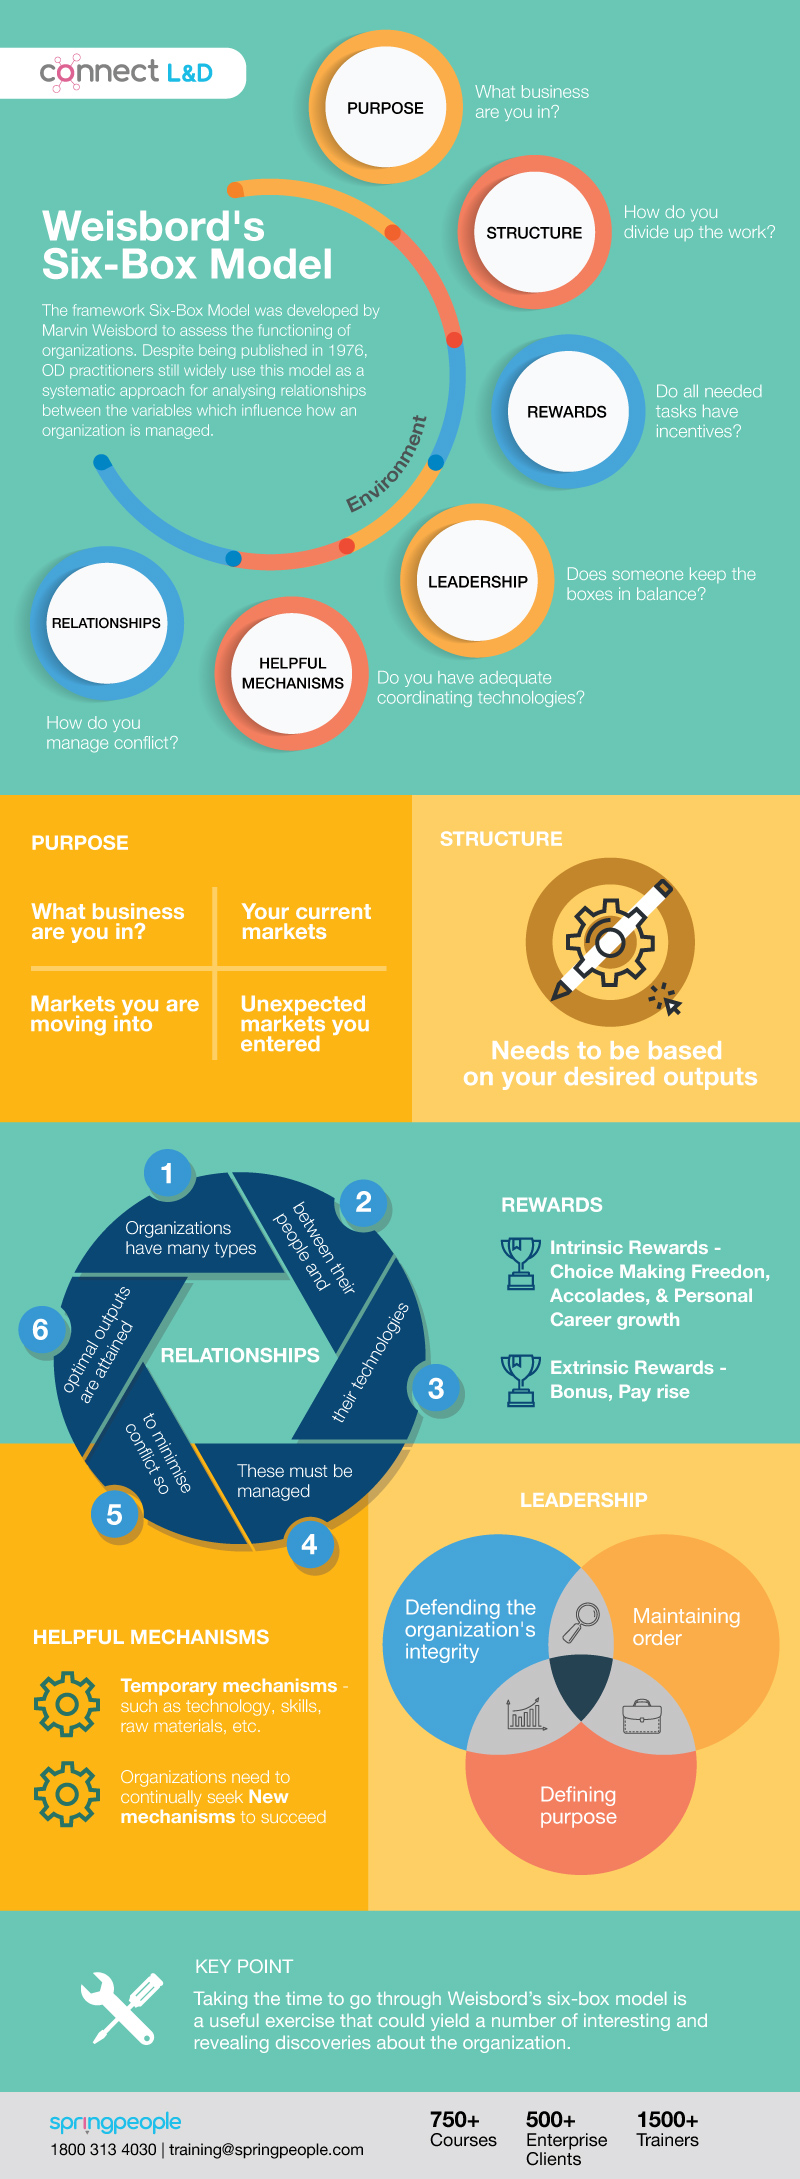 Weisbord's Six-Box Model for Organizational Development